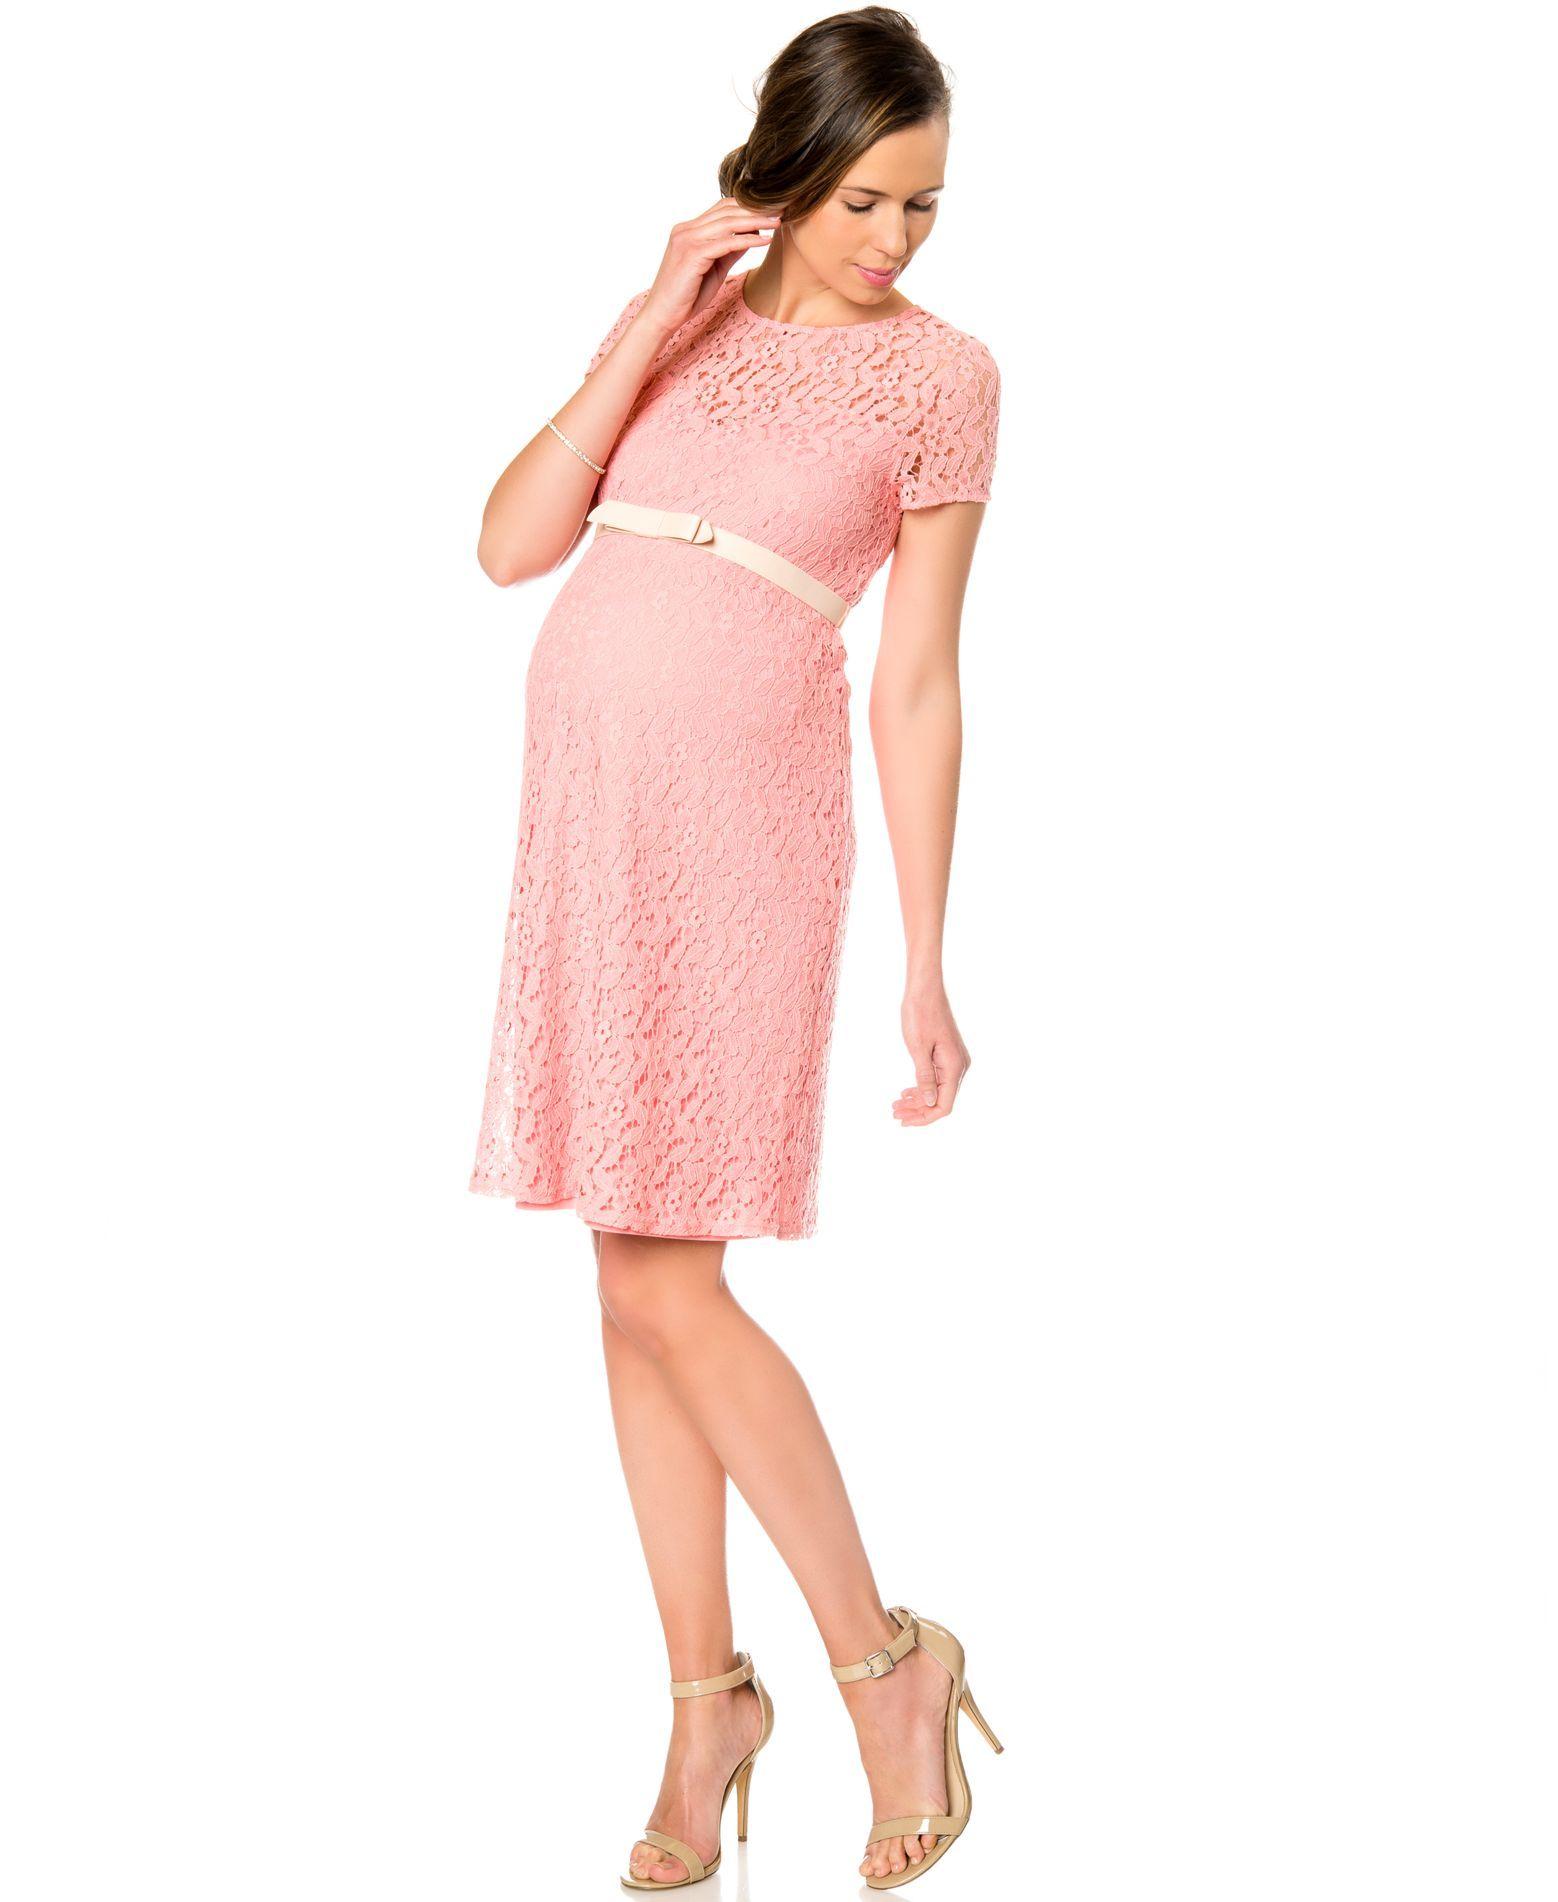 macys maternity dresses formal